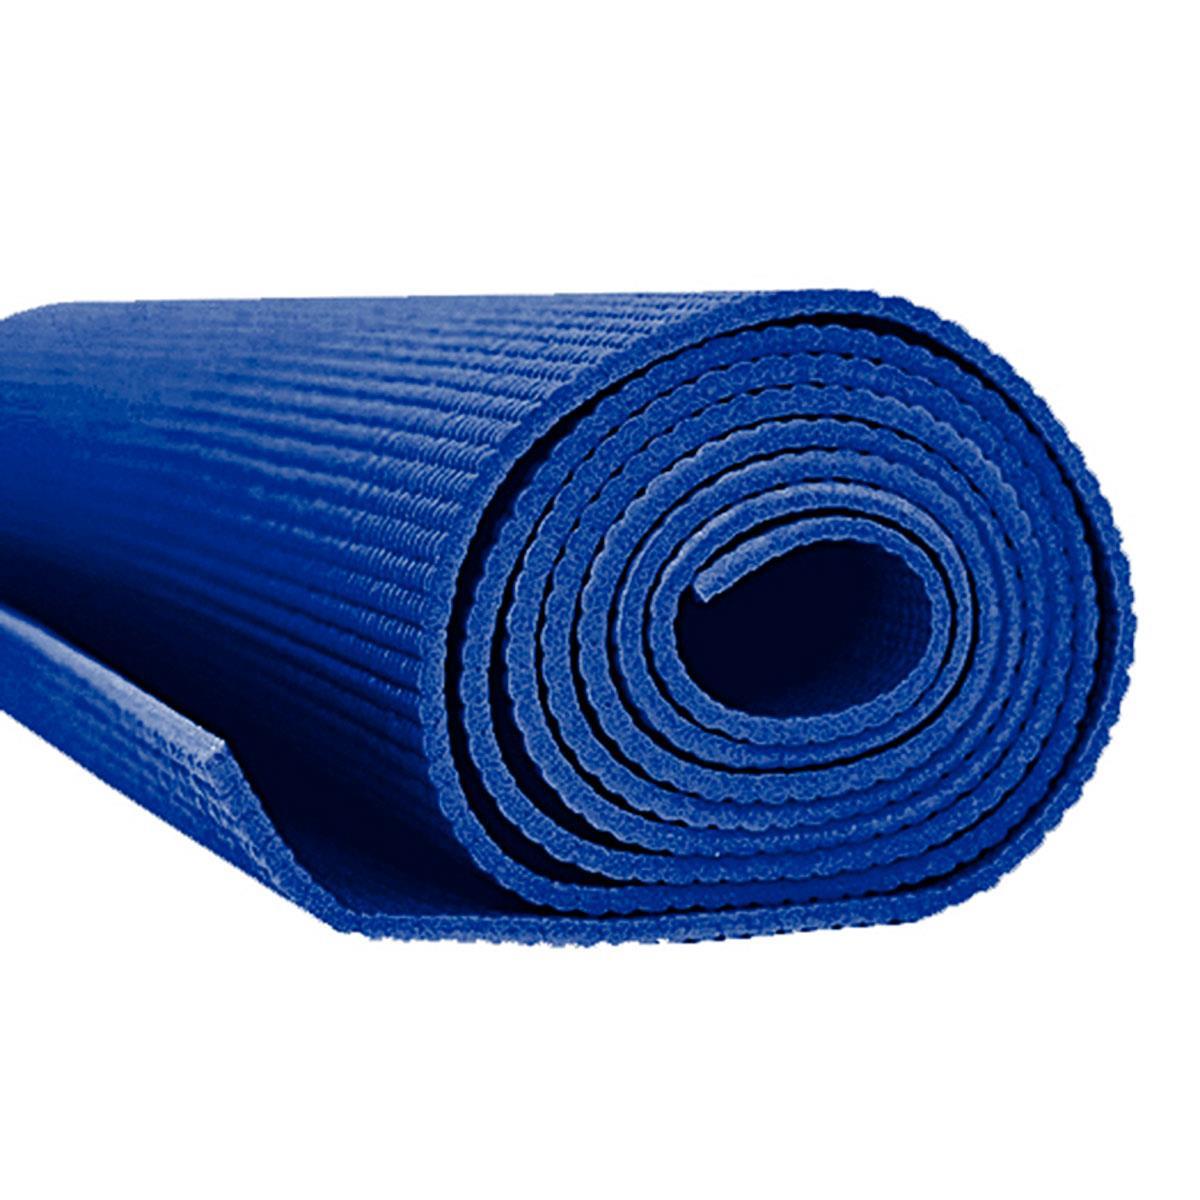 Tapete Para Yoga E Pilates Em Pvc Acte Sports Yoga Mat- Azul